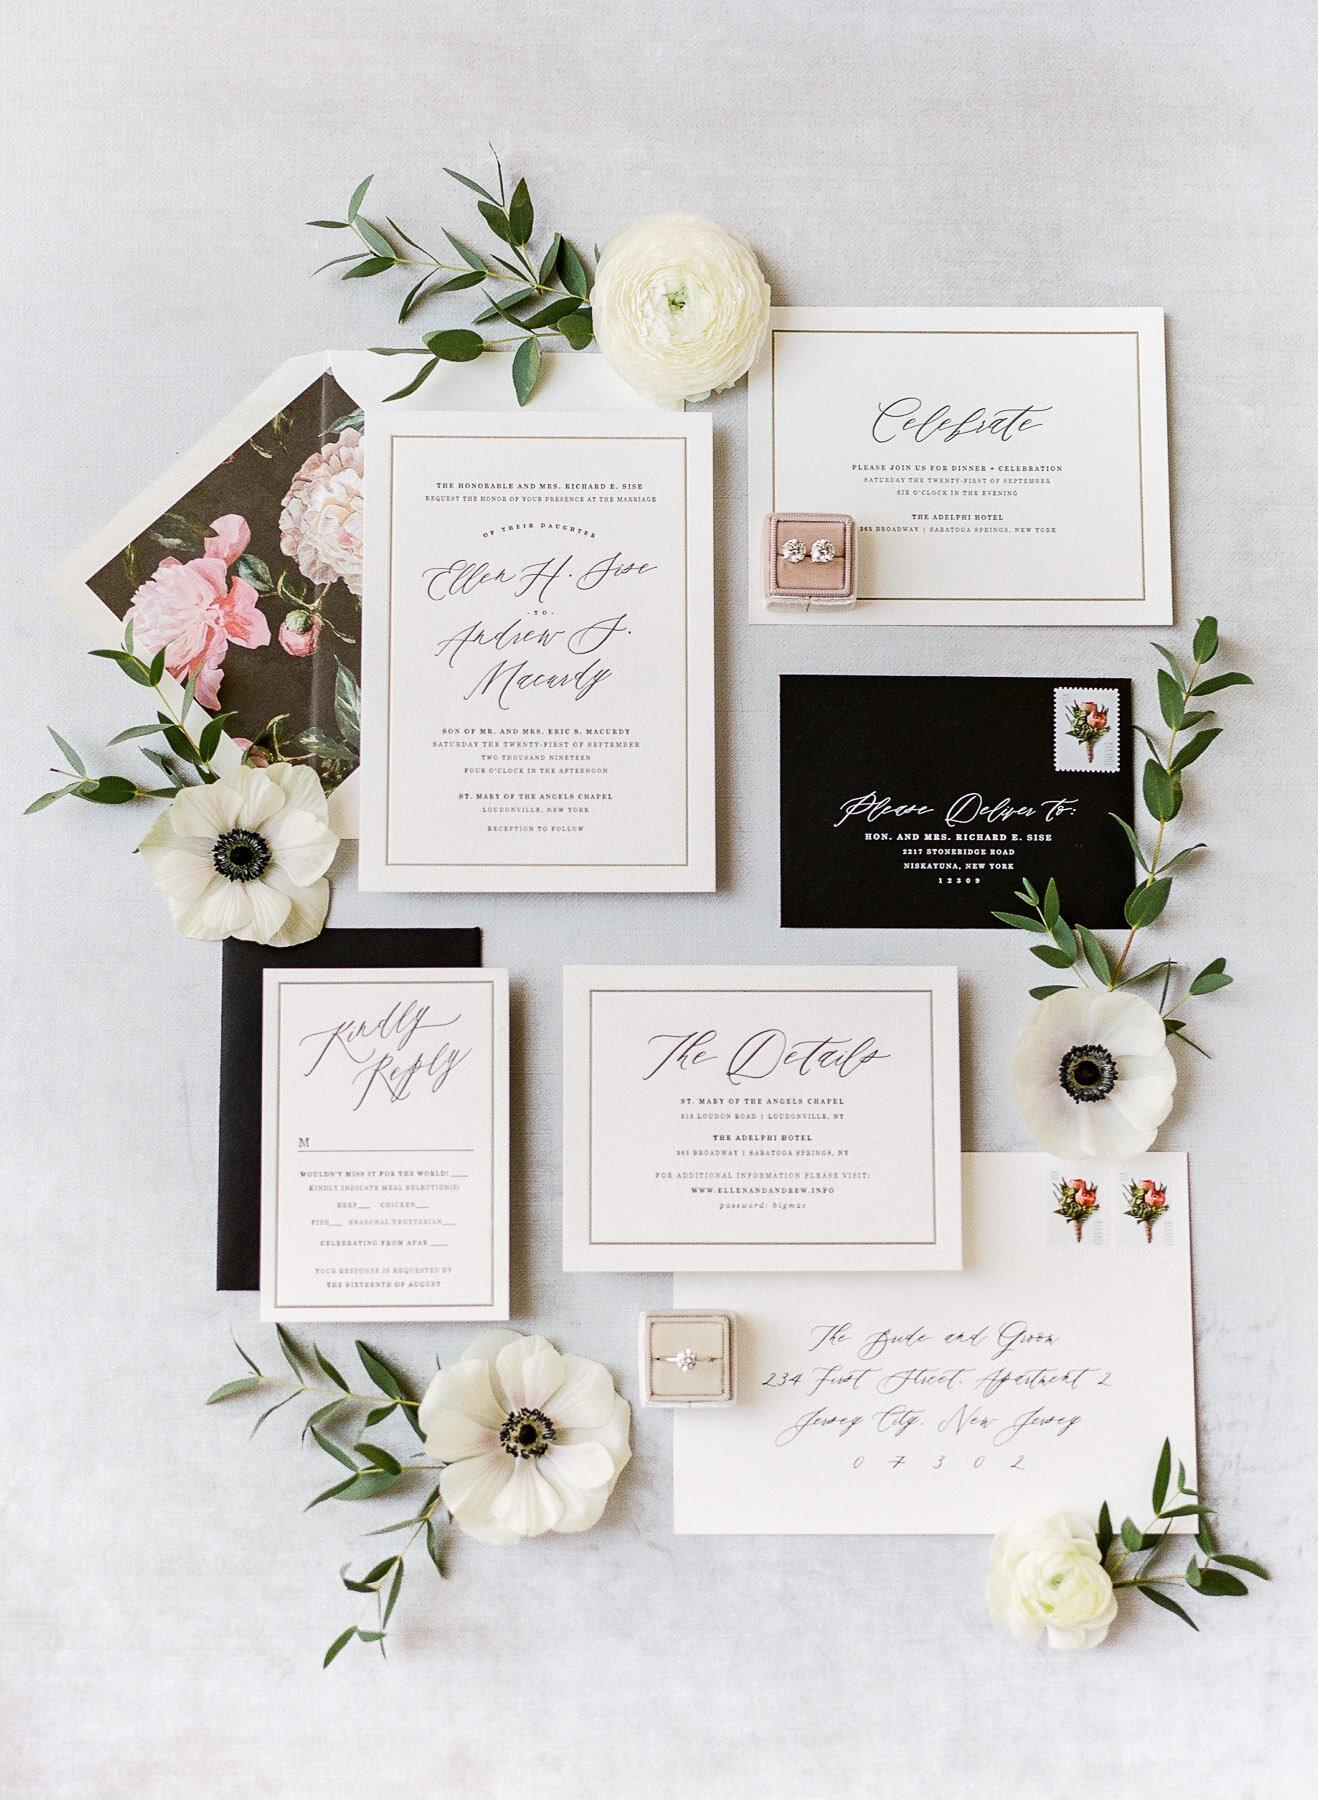 Adelphi Saratoga Wedding by Michelle Lange Photography-1.jpg